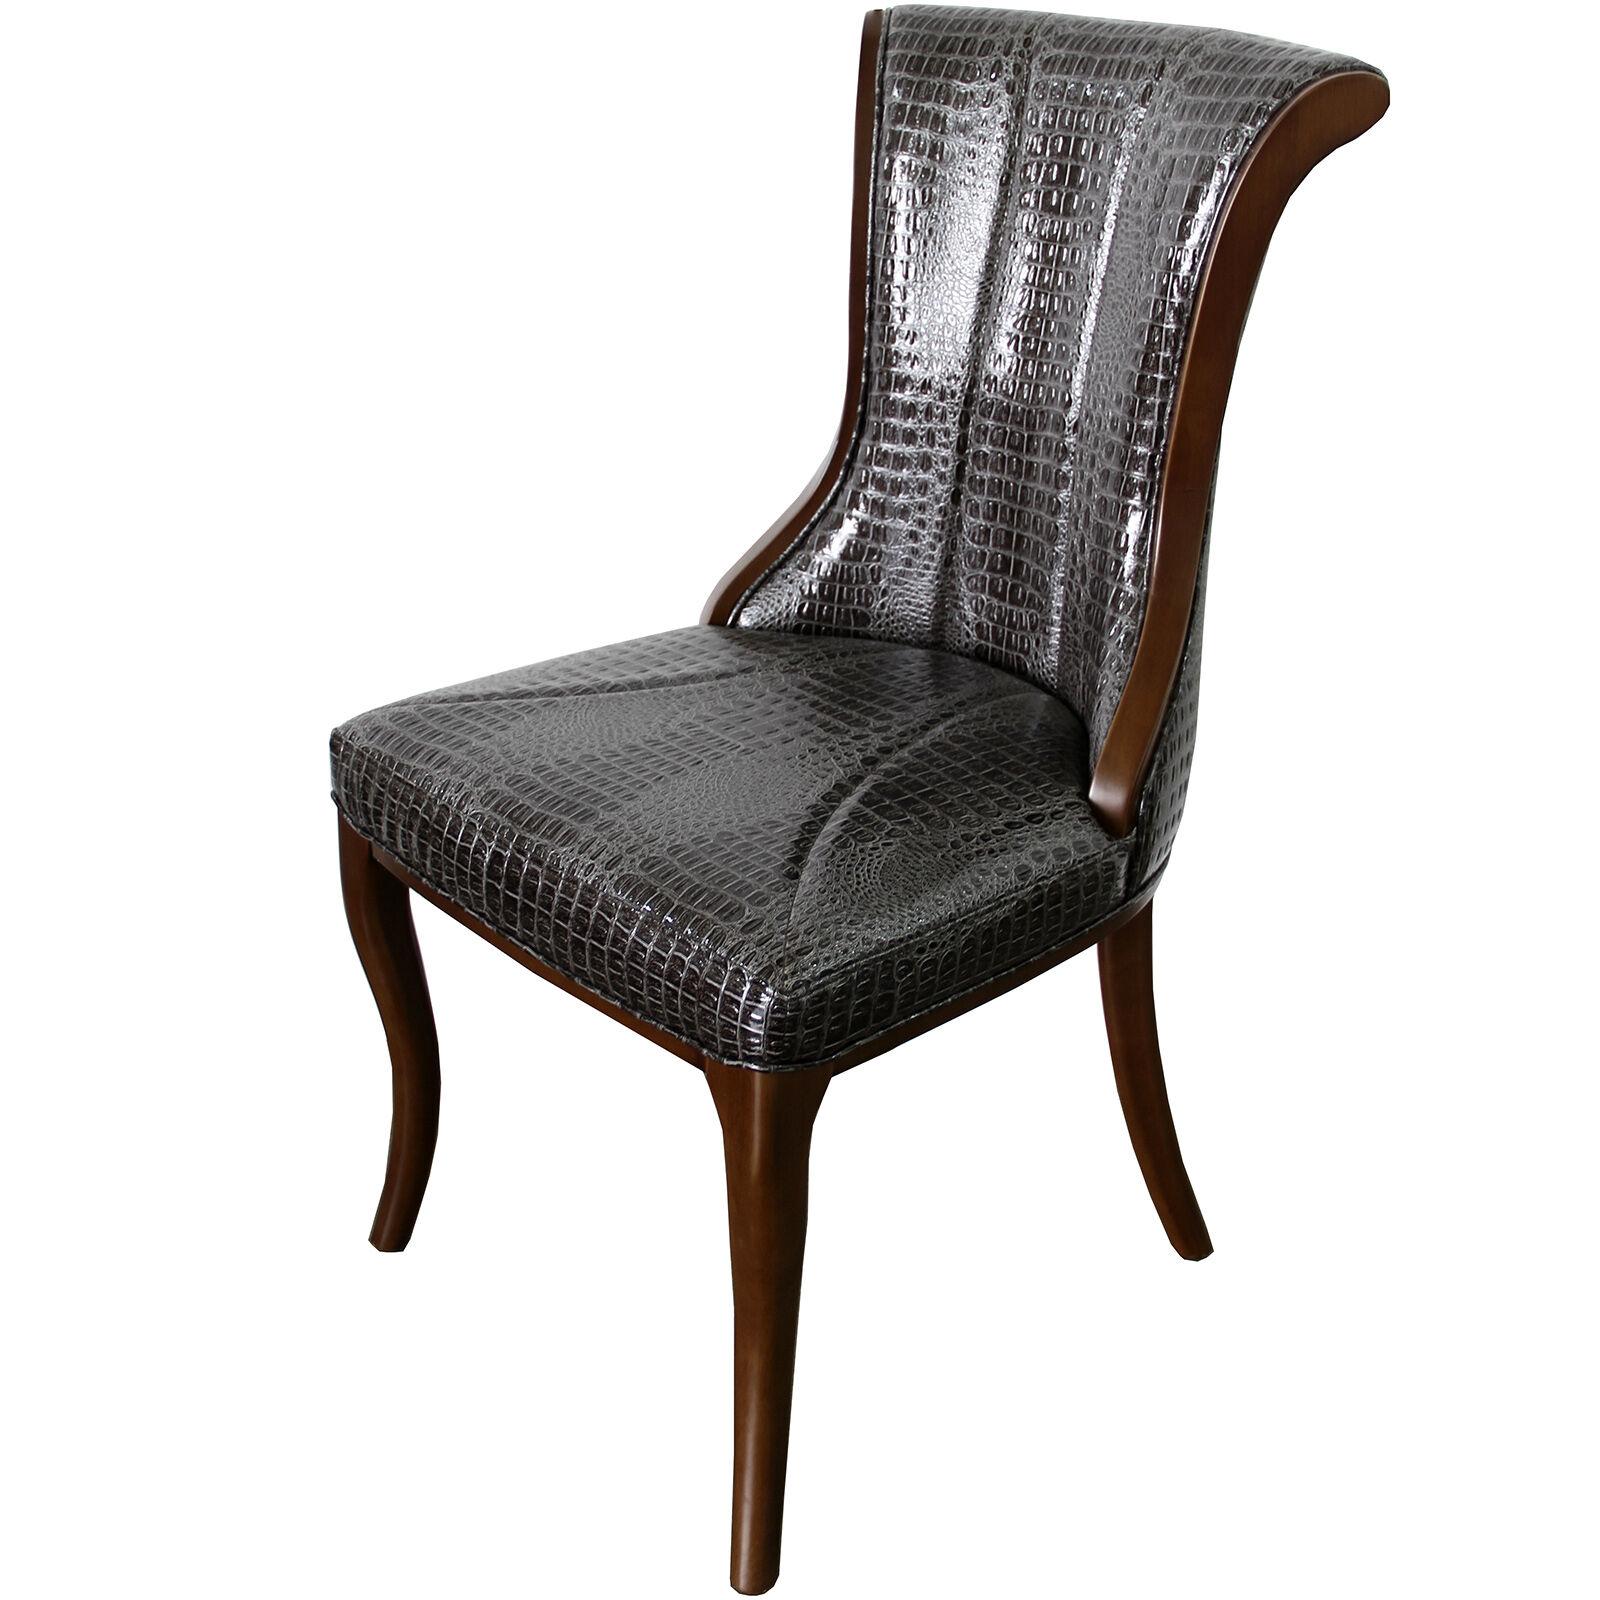 parson chairs cheap fishing high chair banner vin croc ii imp parsons at home zoom